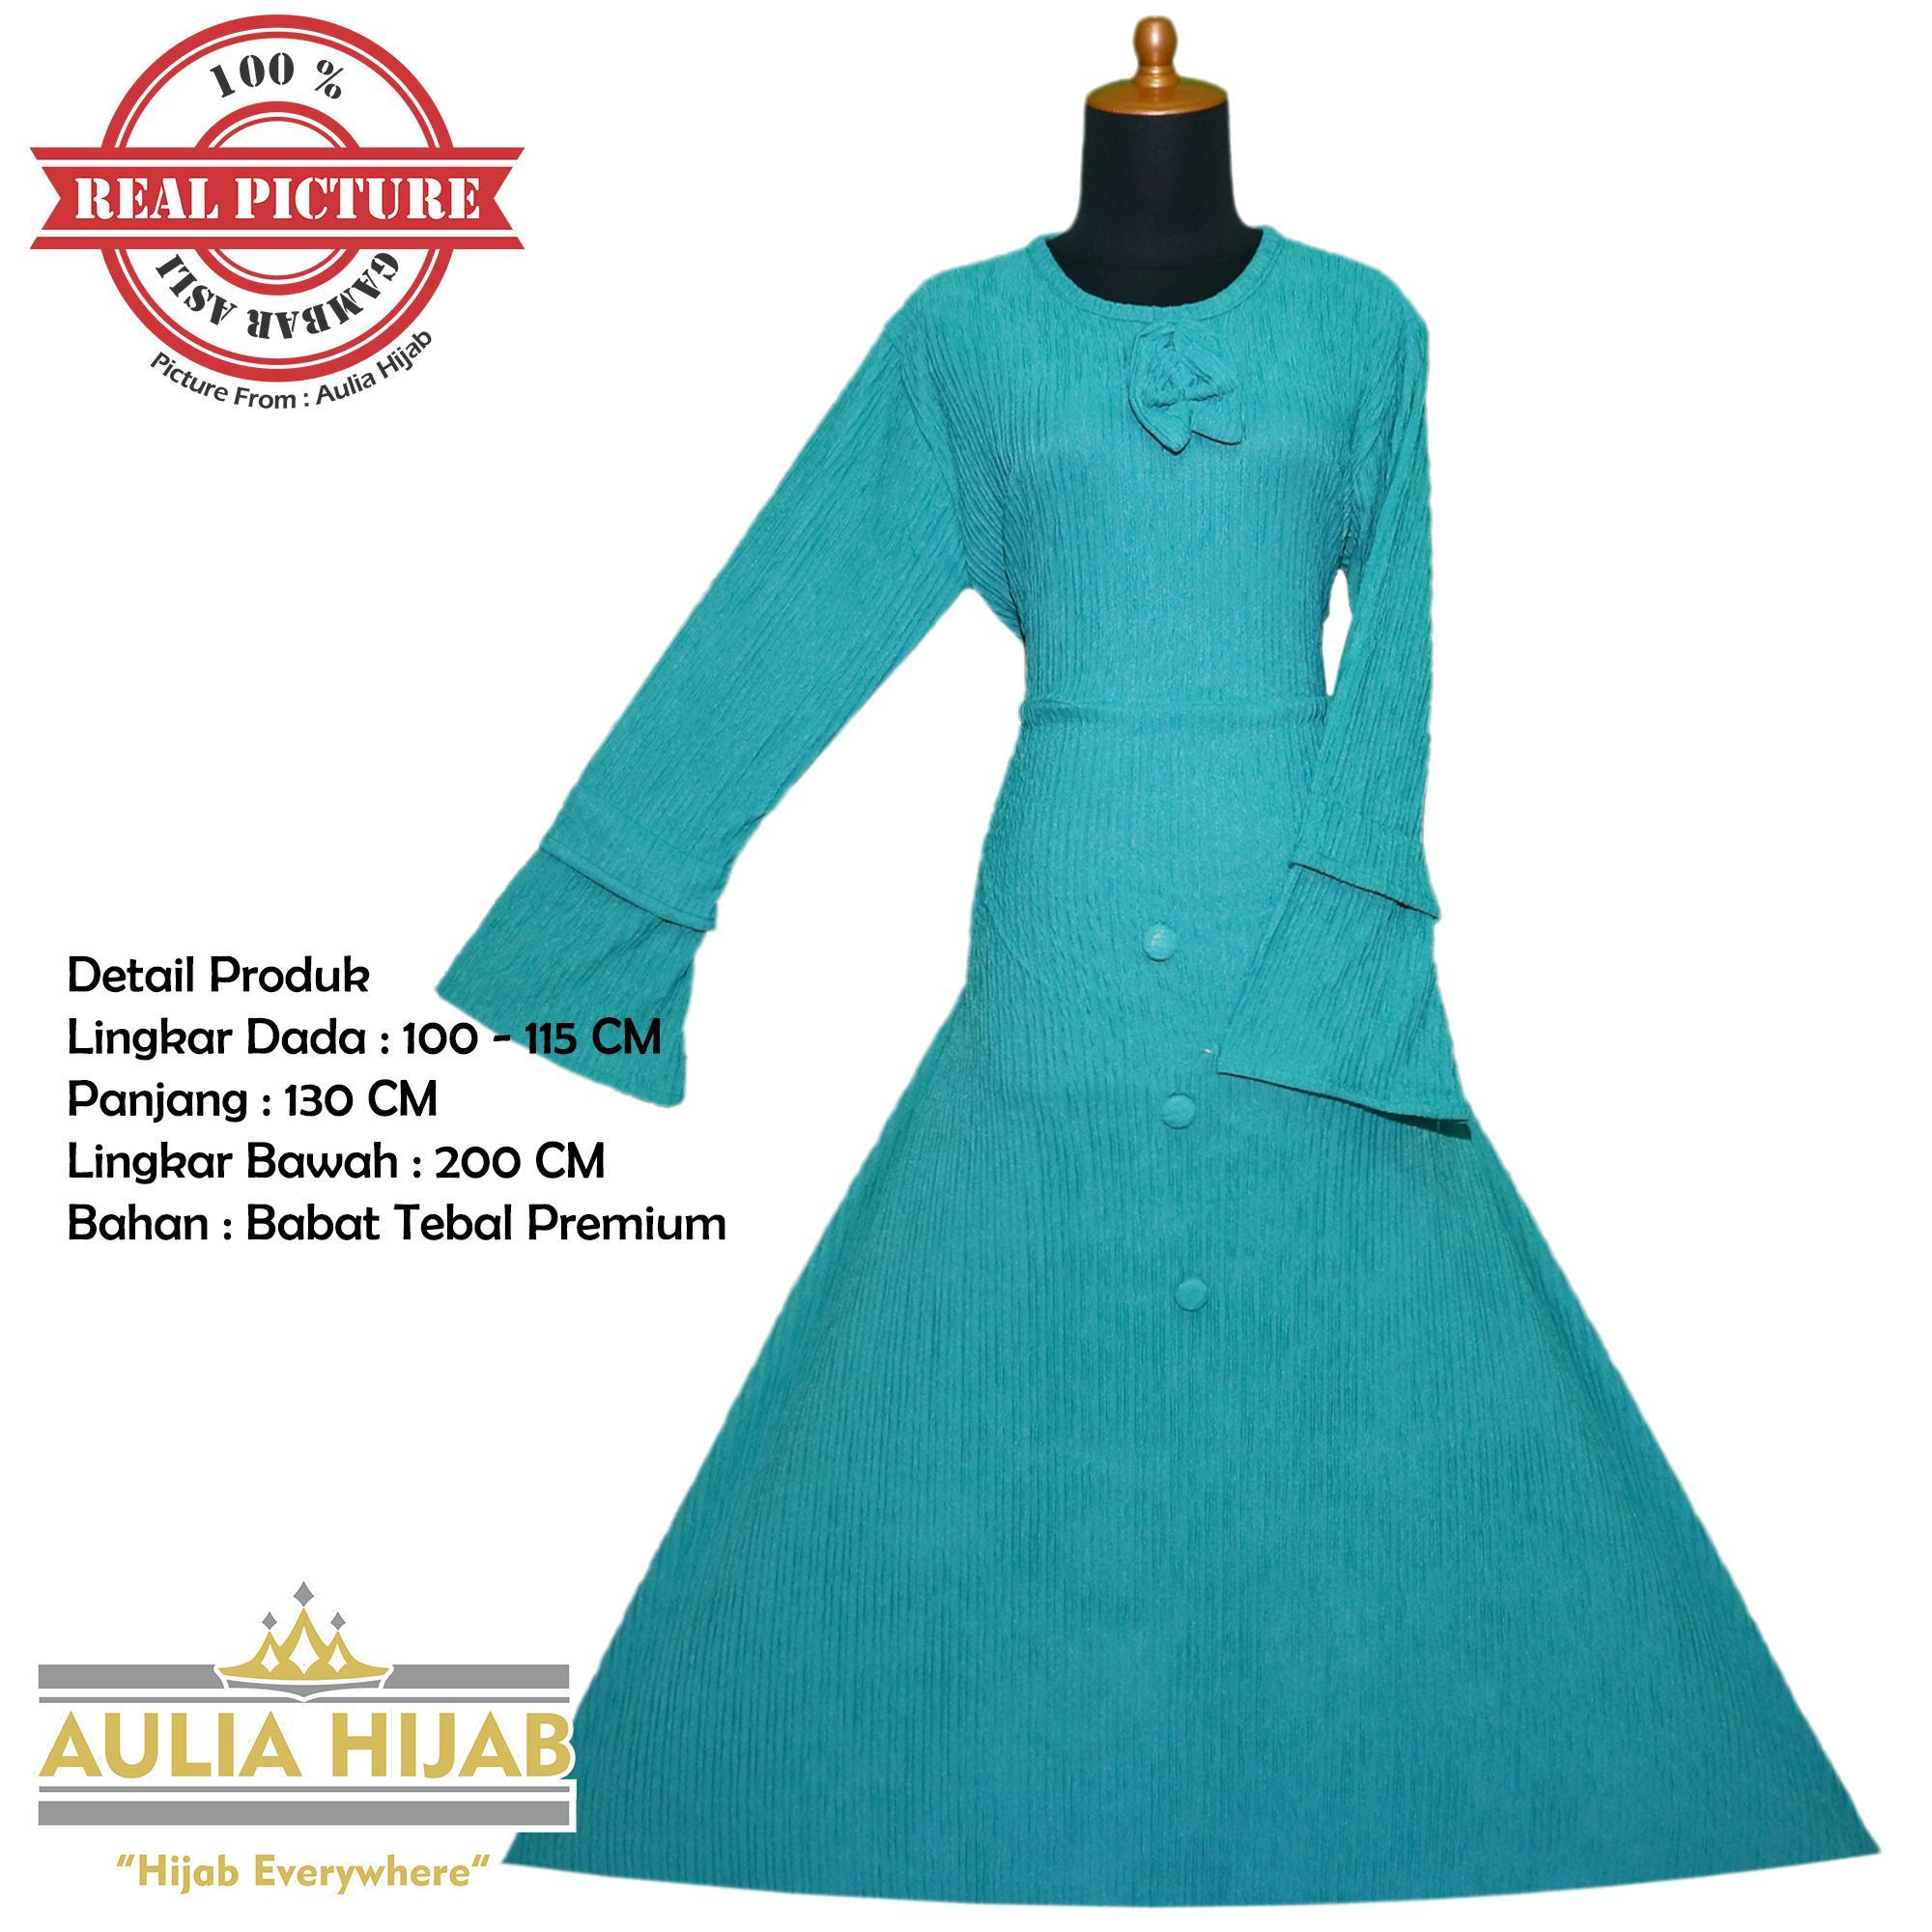 Aulia Hijab - Gamis Ukhti Dress Bahan Babat Tebal Premium/Gamis Babat/Gamis Tebal/Gamis Premium/Gamis Polos/Gamis Terbaik/Gamis Best Seller/Gamis Terbaru/Gamis Cantik/Gamis Arsy/Gamis Cantik